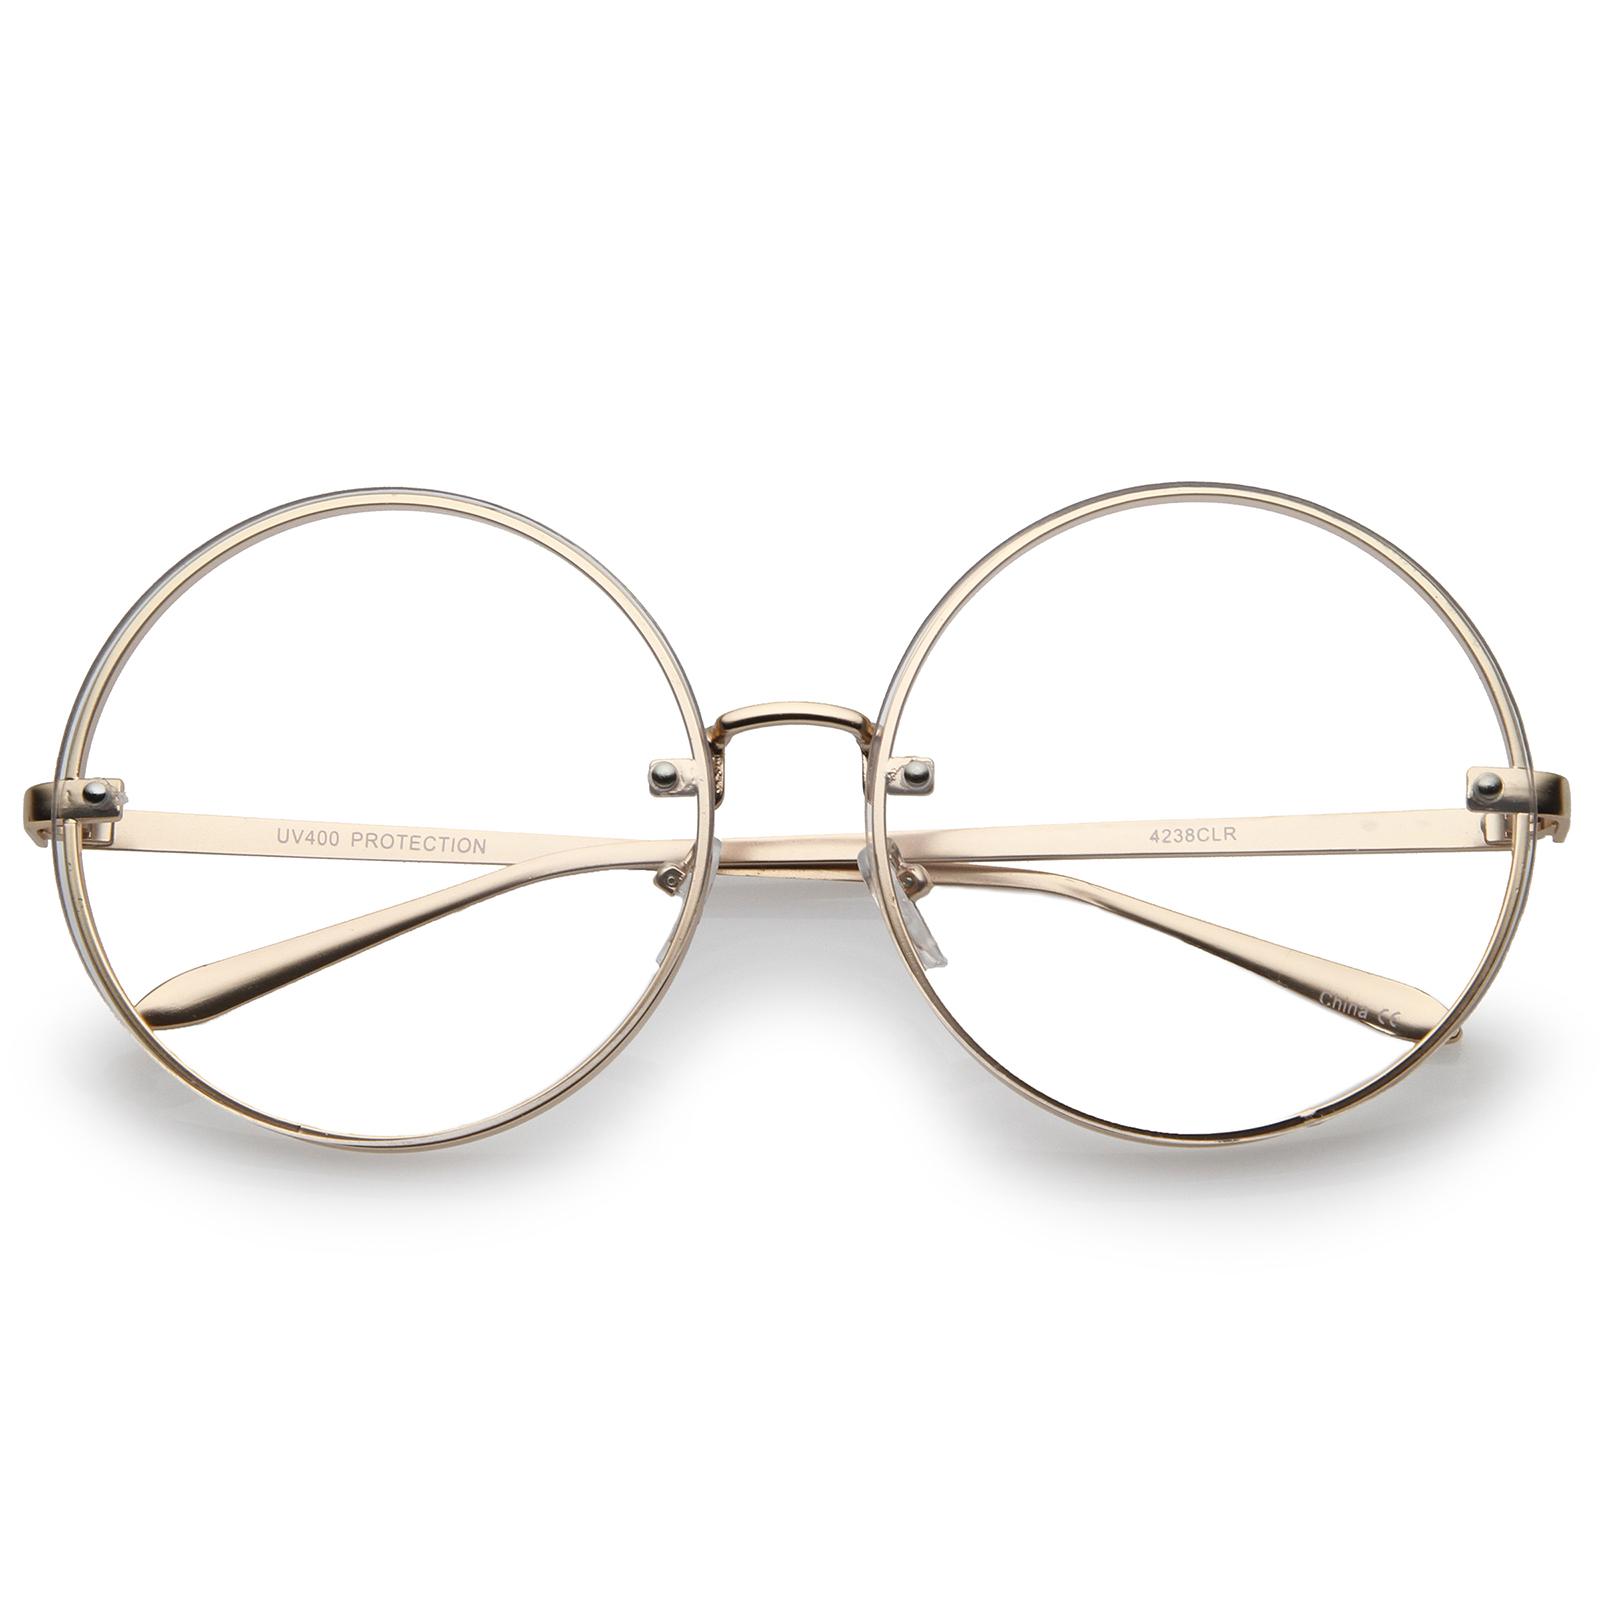 sunglassLA - Oversize Metal Slim Temple Flat Lens Round Eyeglasses 65mm (Gold / Clear) - 65mm